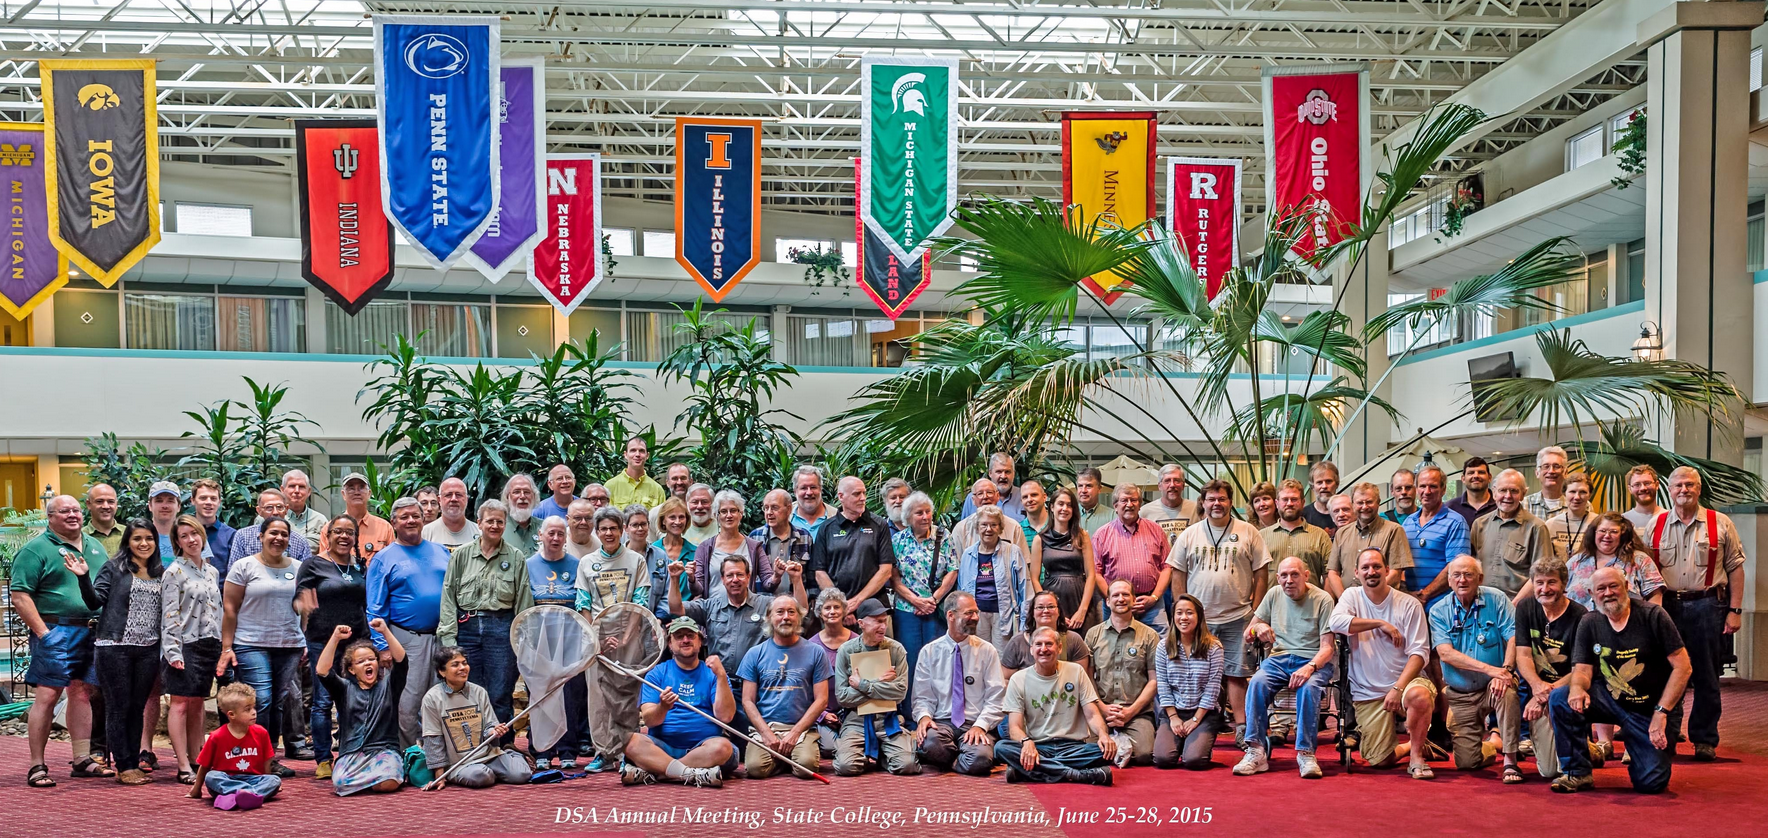 DSA 2015 Group Photo